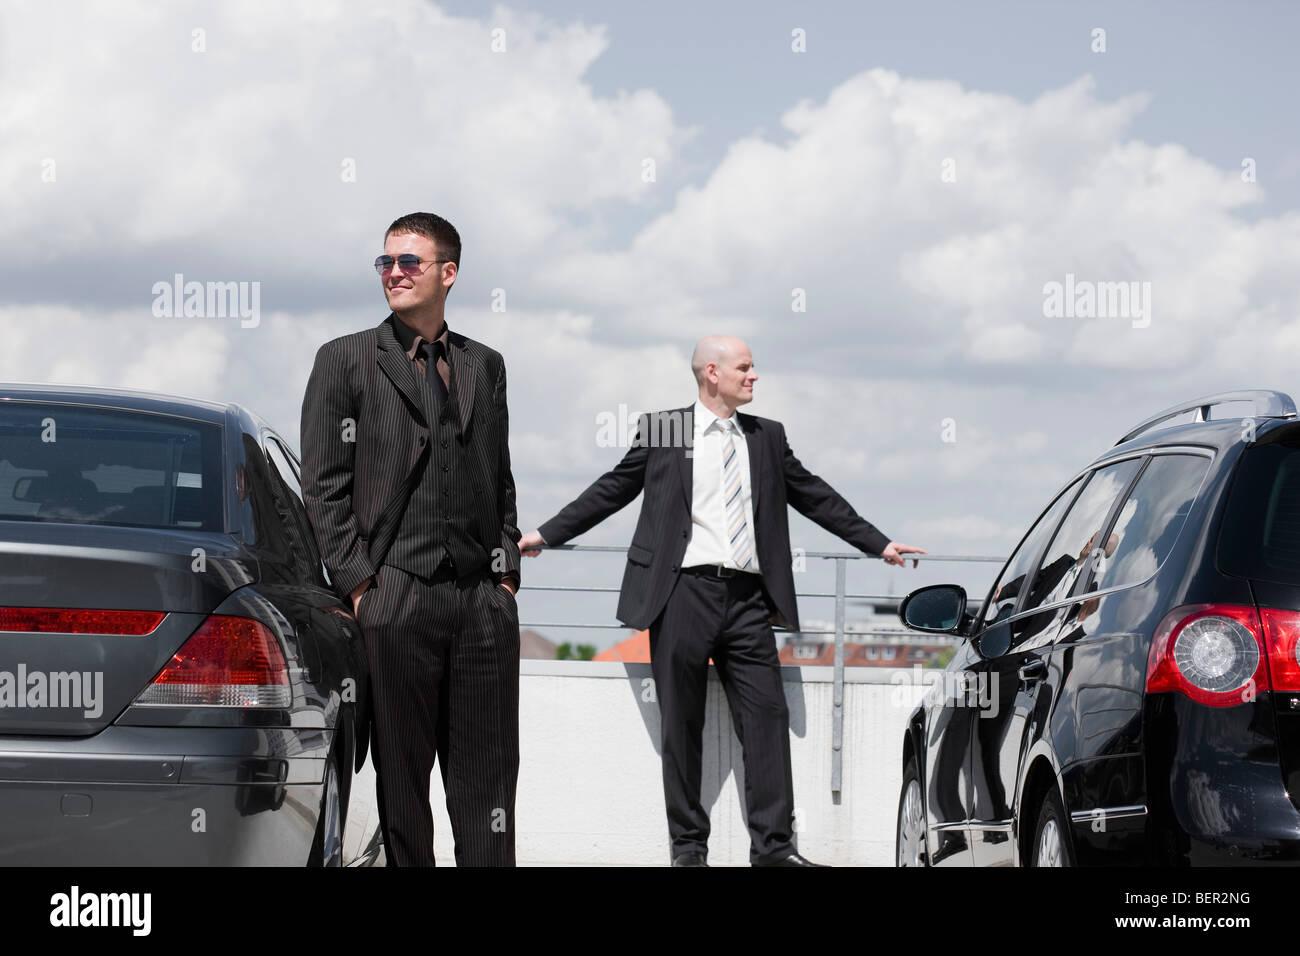 two business men standing between cars - Stock Image